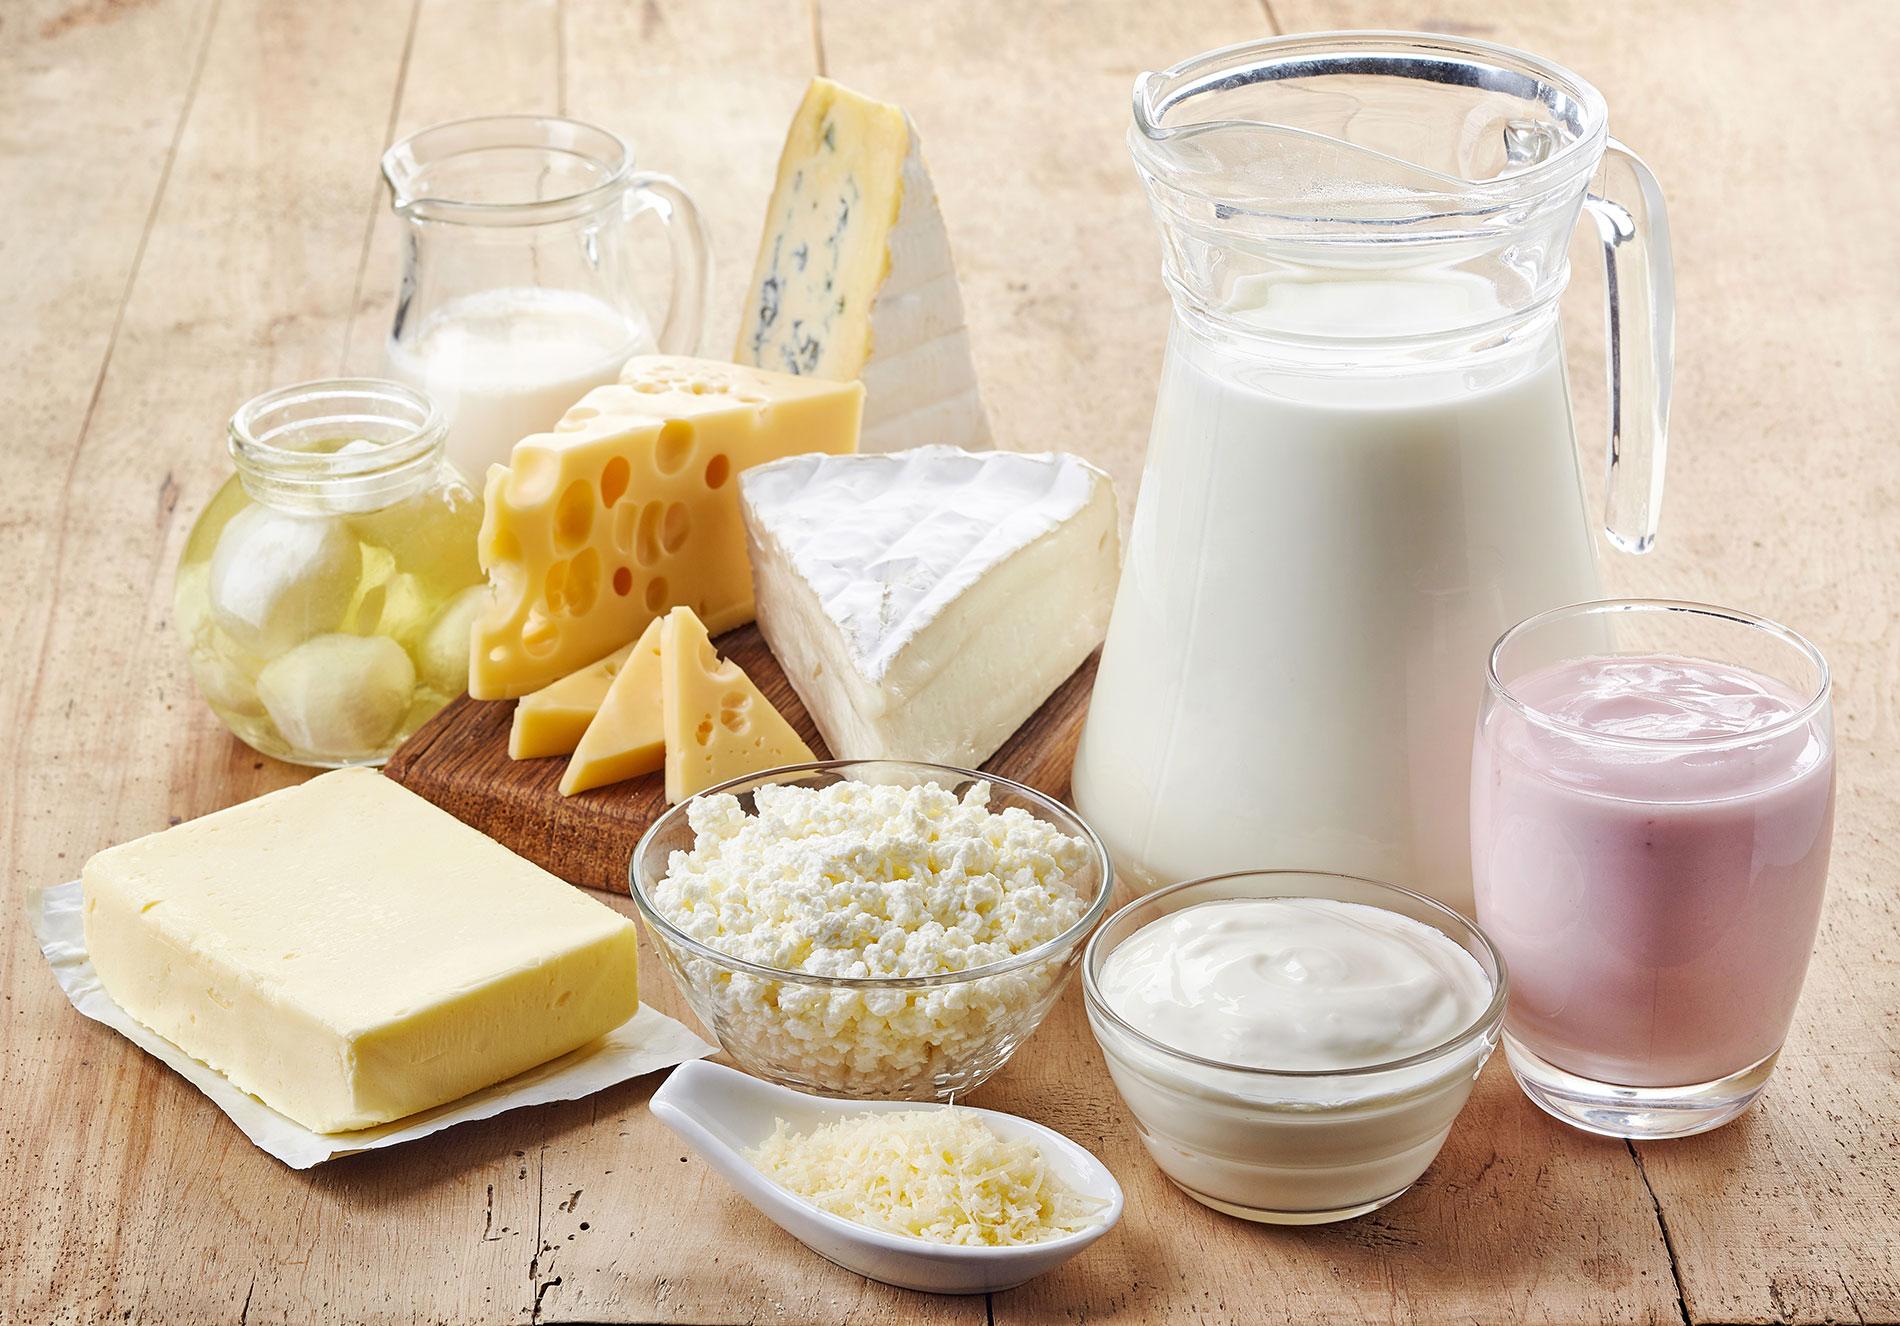 Global Transglutaminase for Dairy Market 2020 Competitive Analysis –  Ajinomoto, Pangbo Biological, BDF Natural Ingredients, C & P Group GmbH –  The Daily Chronicle